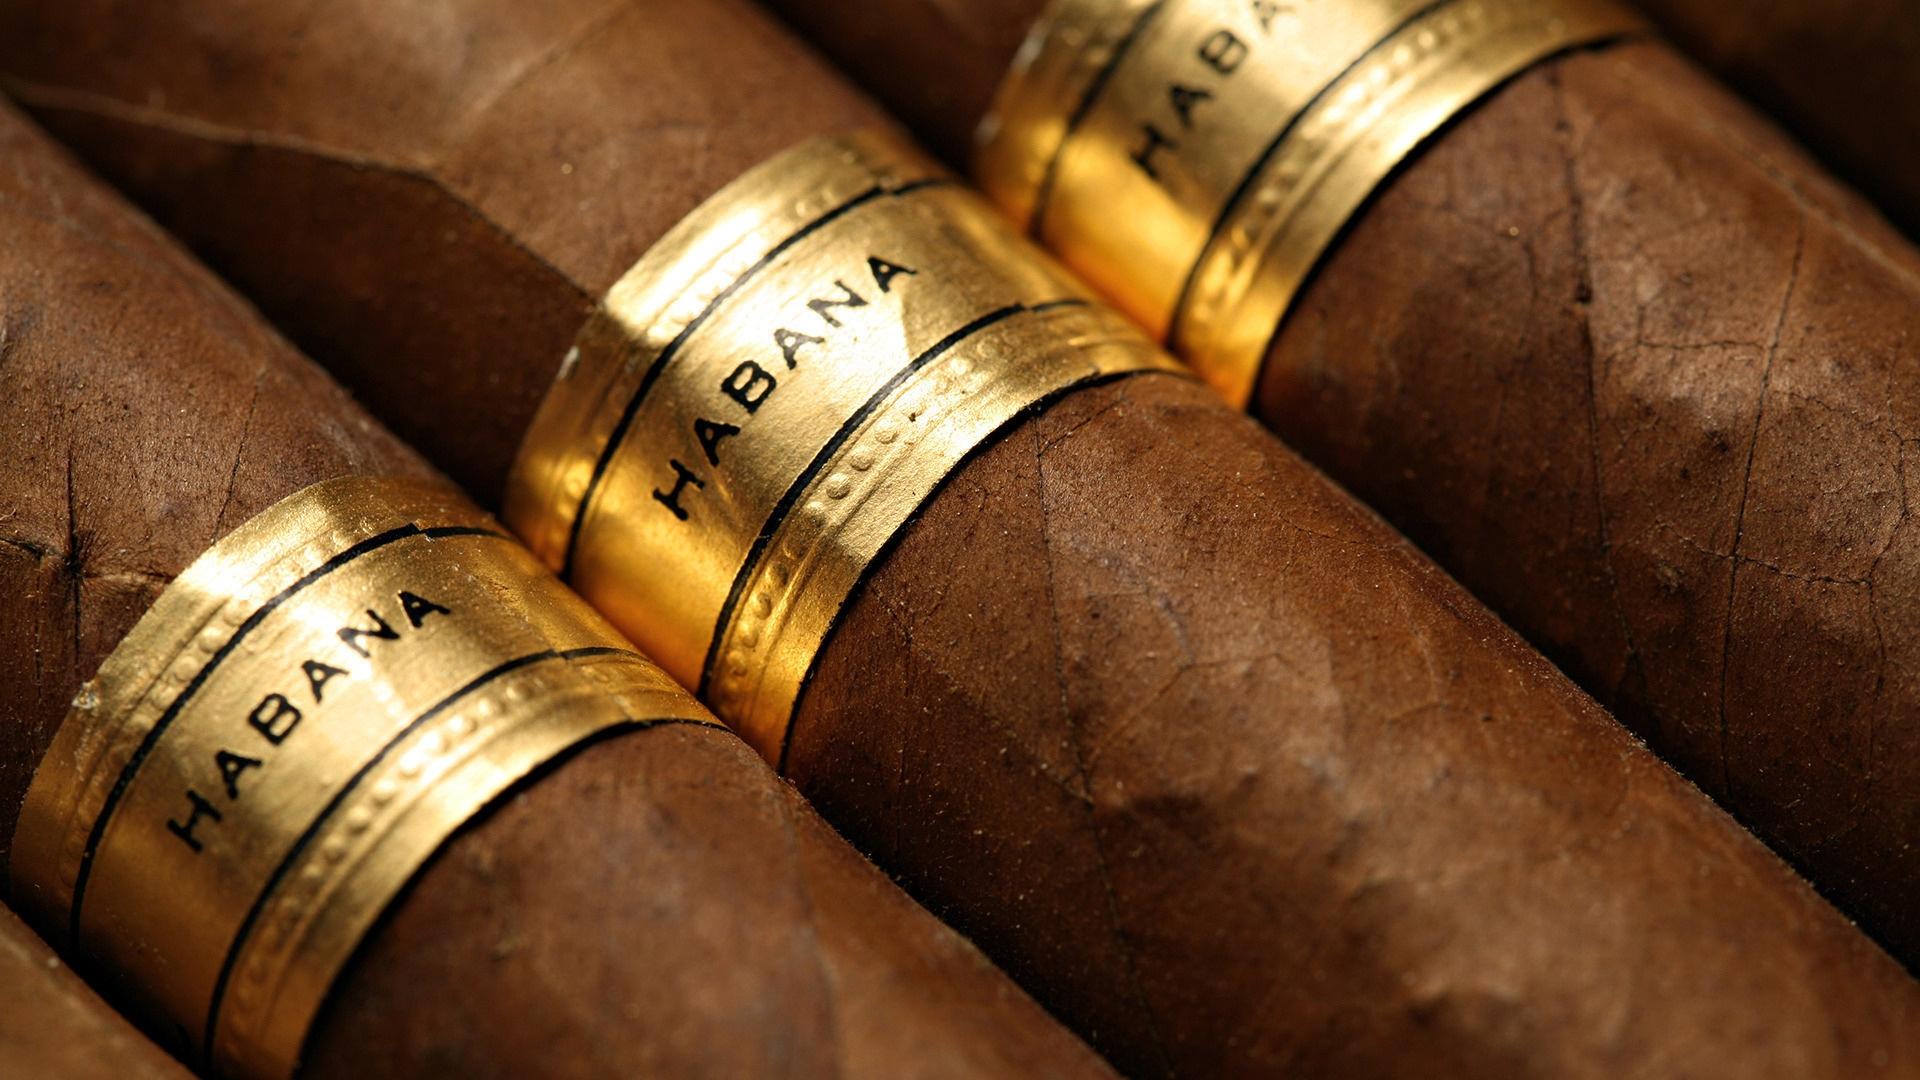 Rooney Mara Wallpaper Hd 8 Excellent Hd Cigar Wallpapers Hdwallsource Com